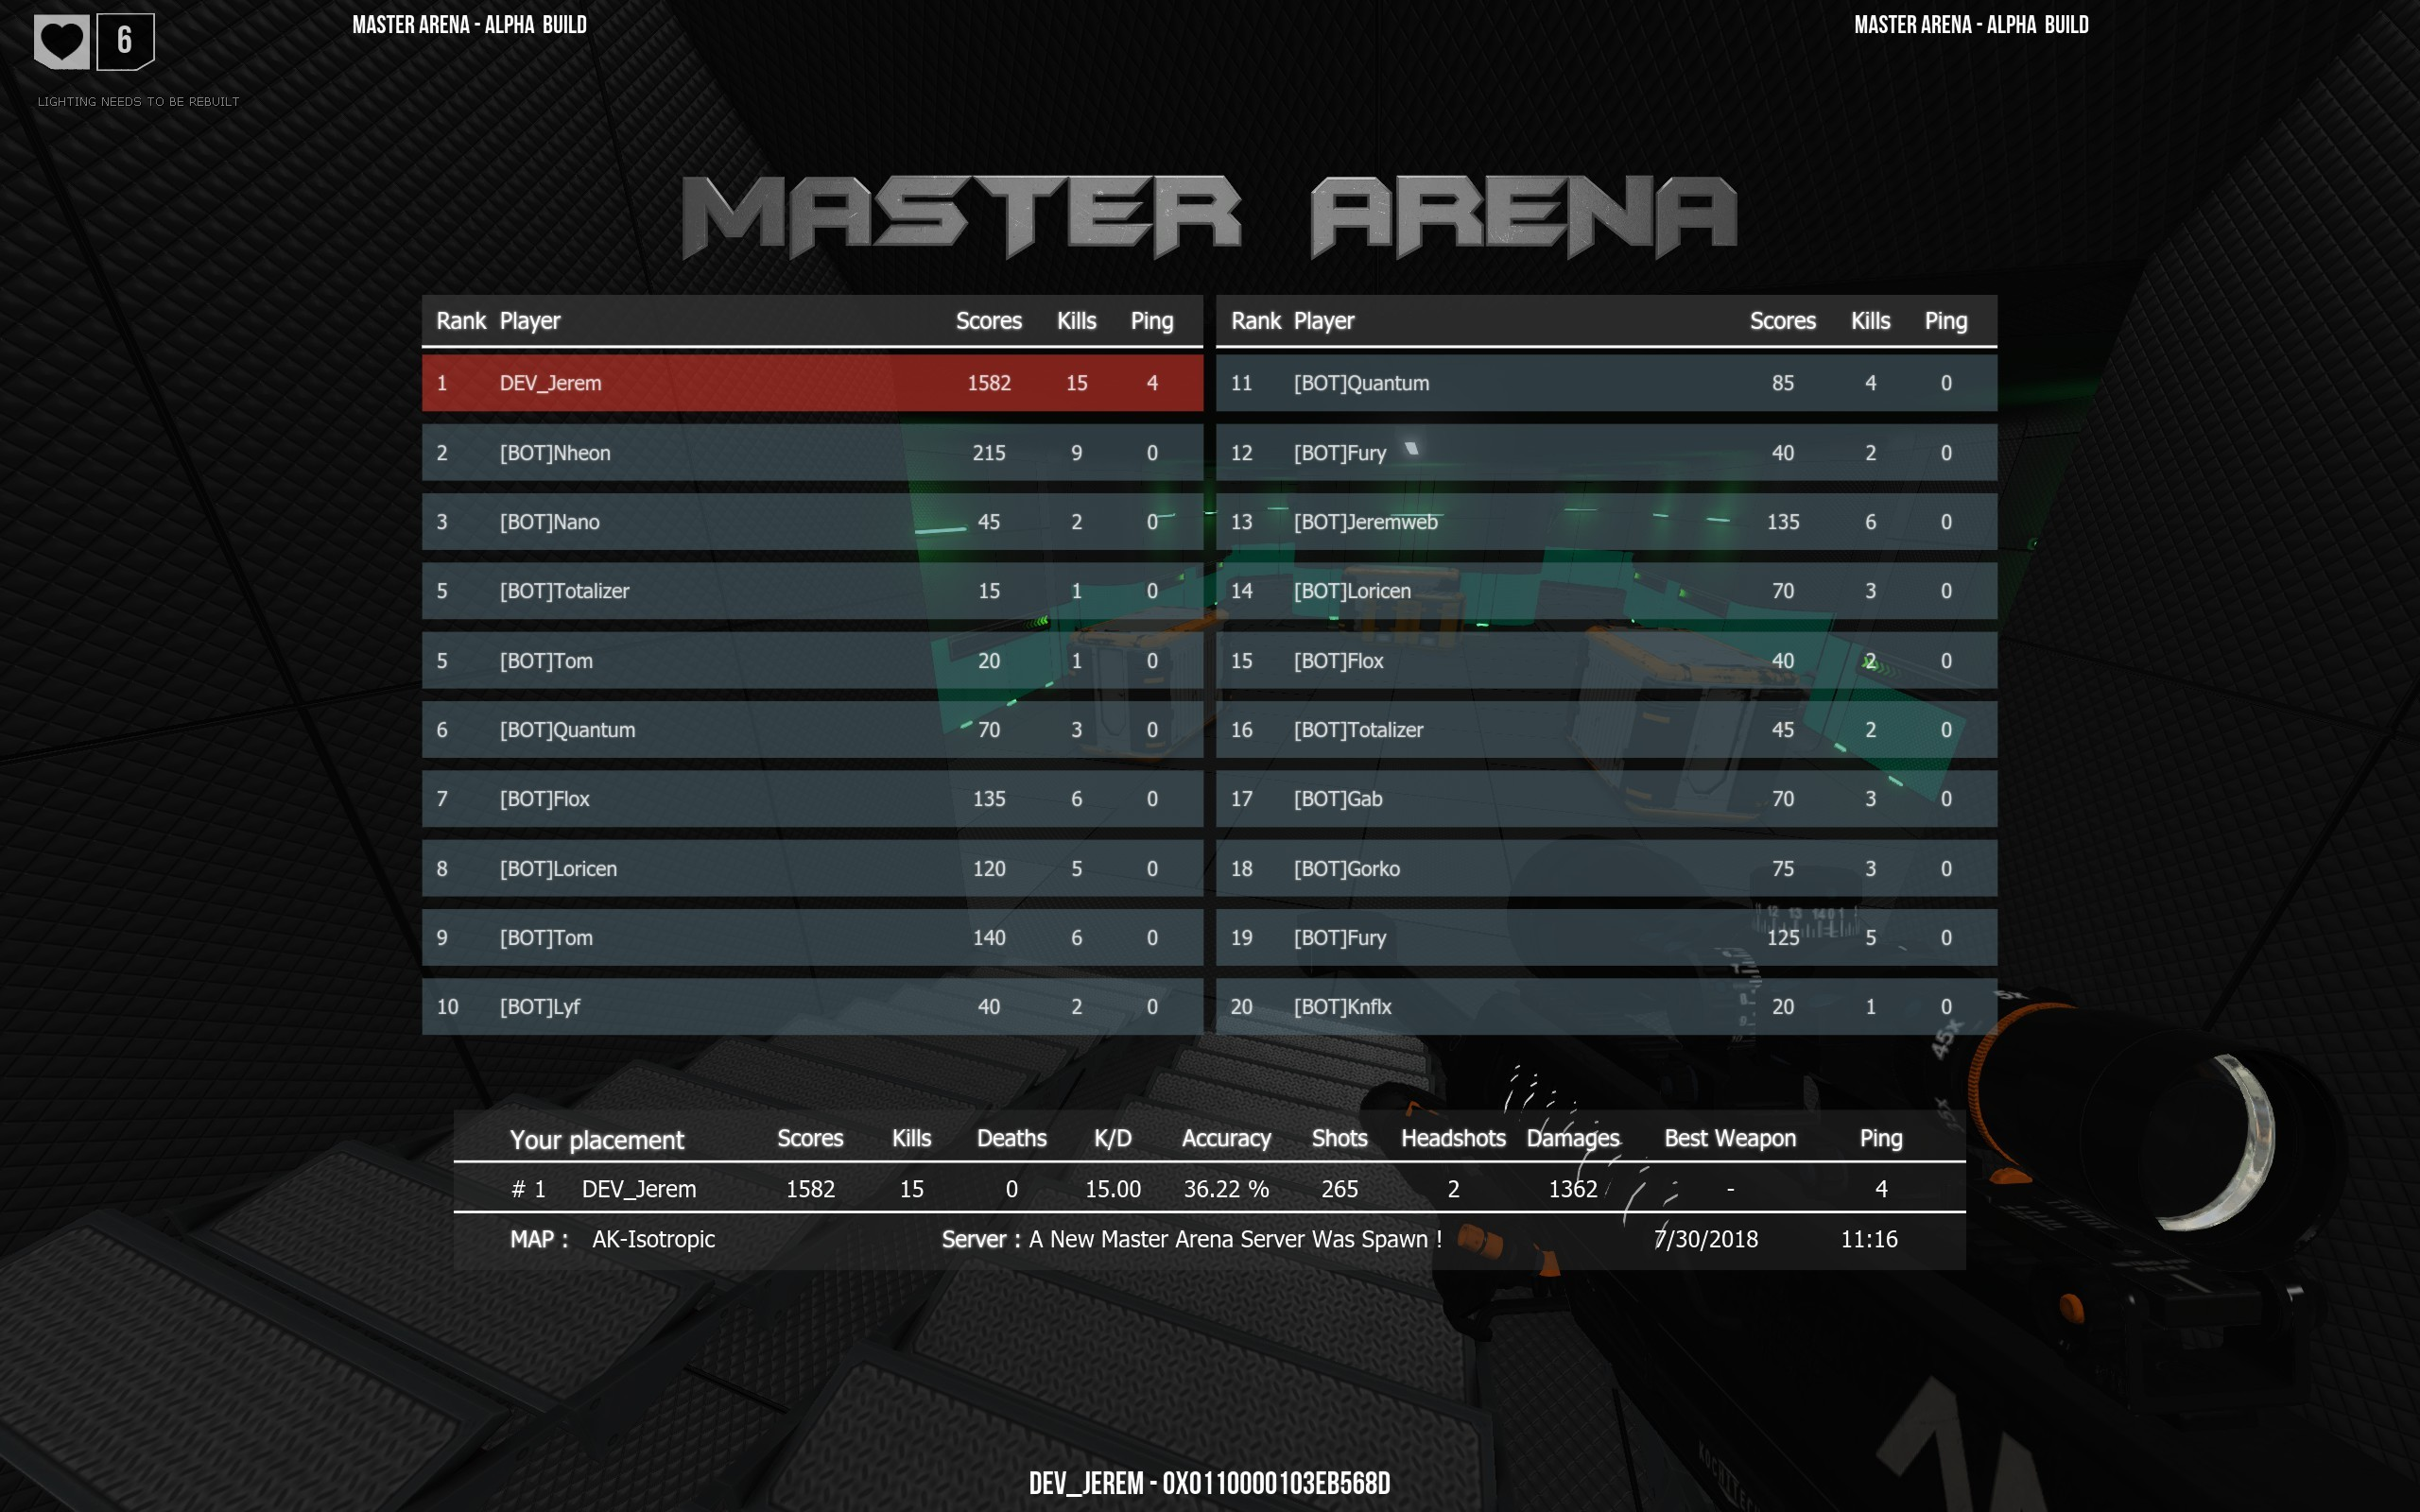 Sep 27, 2018 Update September 2018 Master Arena - DarK